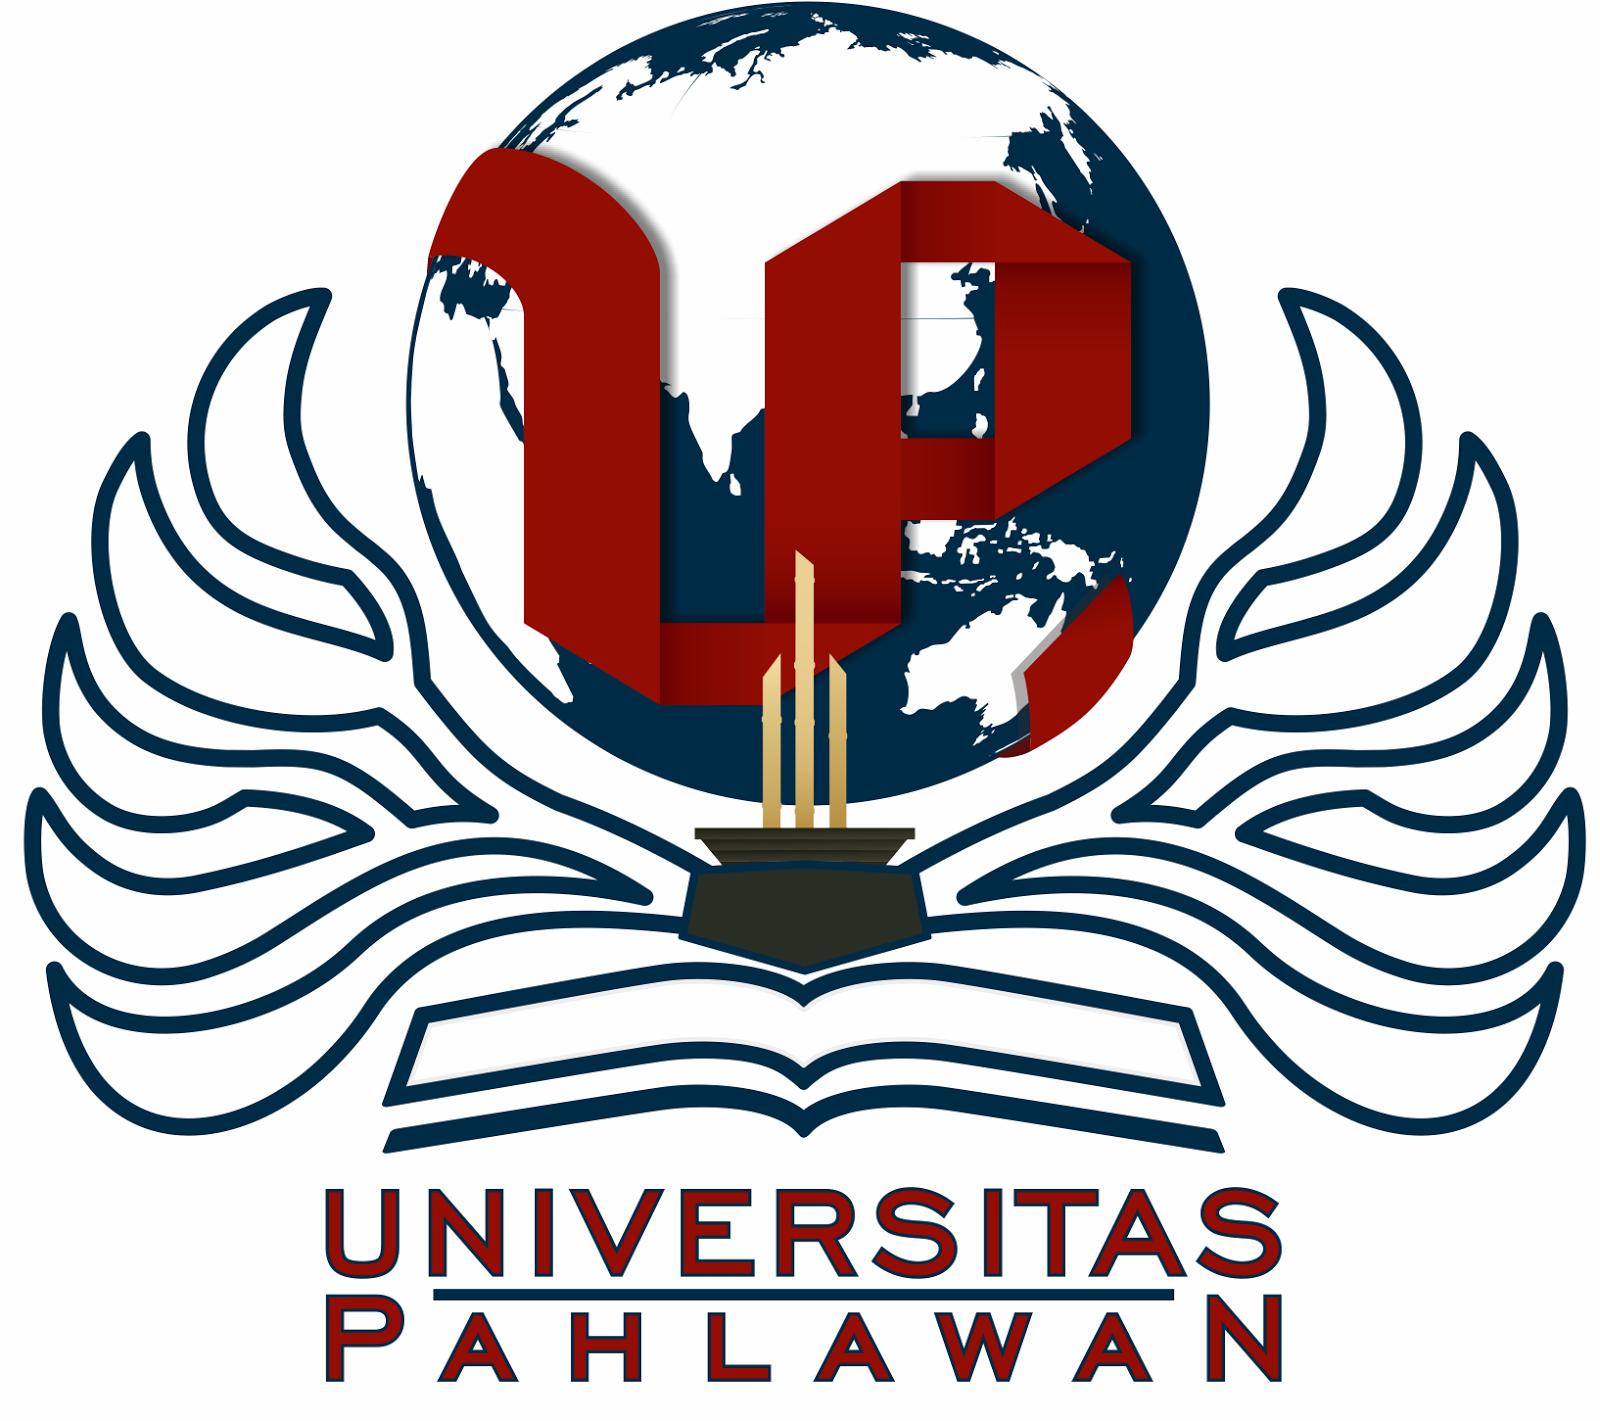 Logo Universitas Pahlawan - PRODI PG-PAUD Universitas Pahlawan